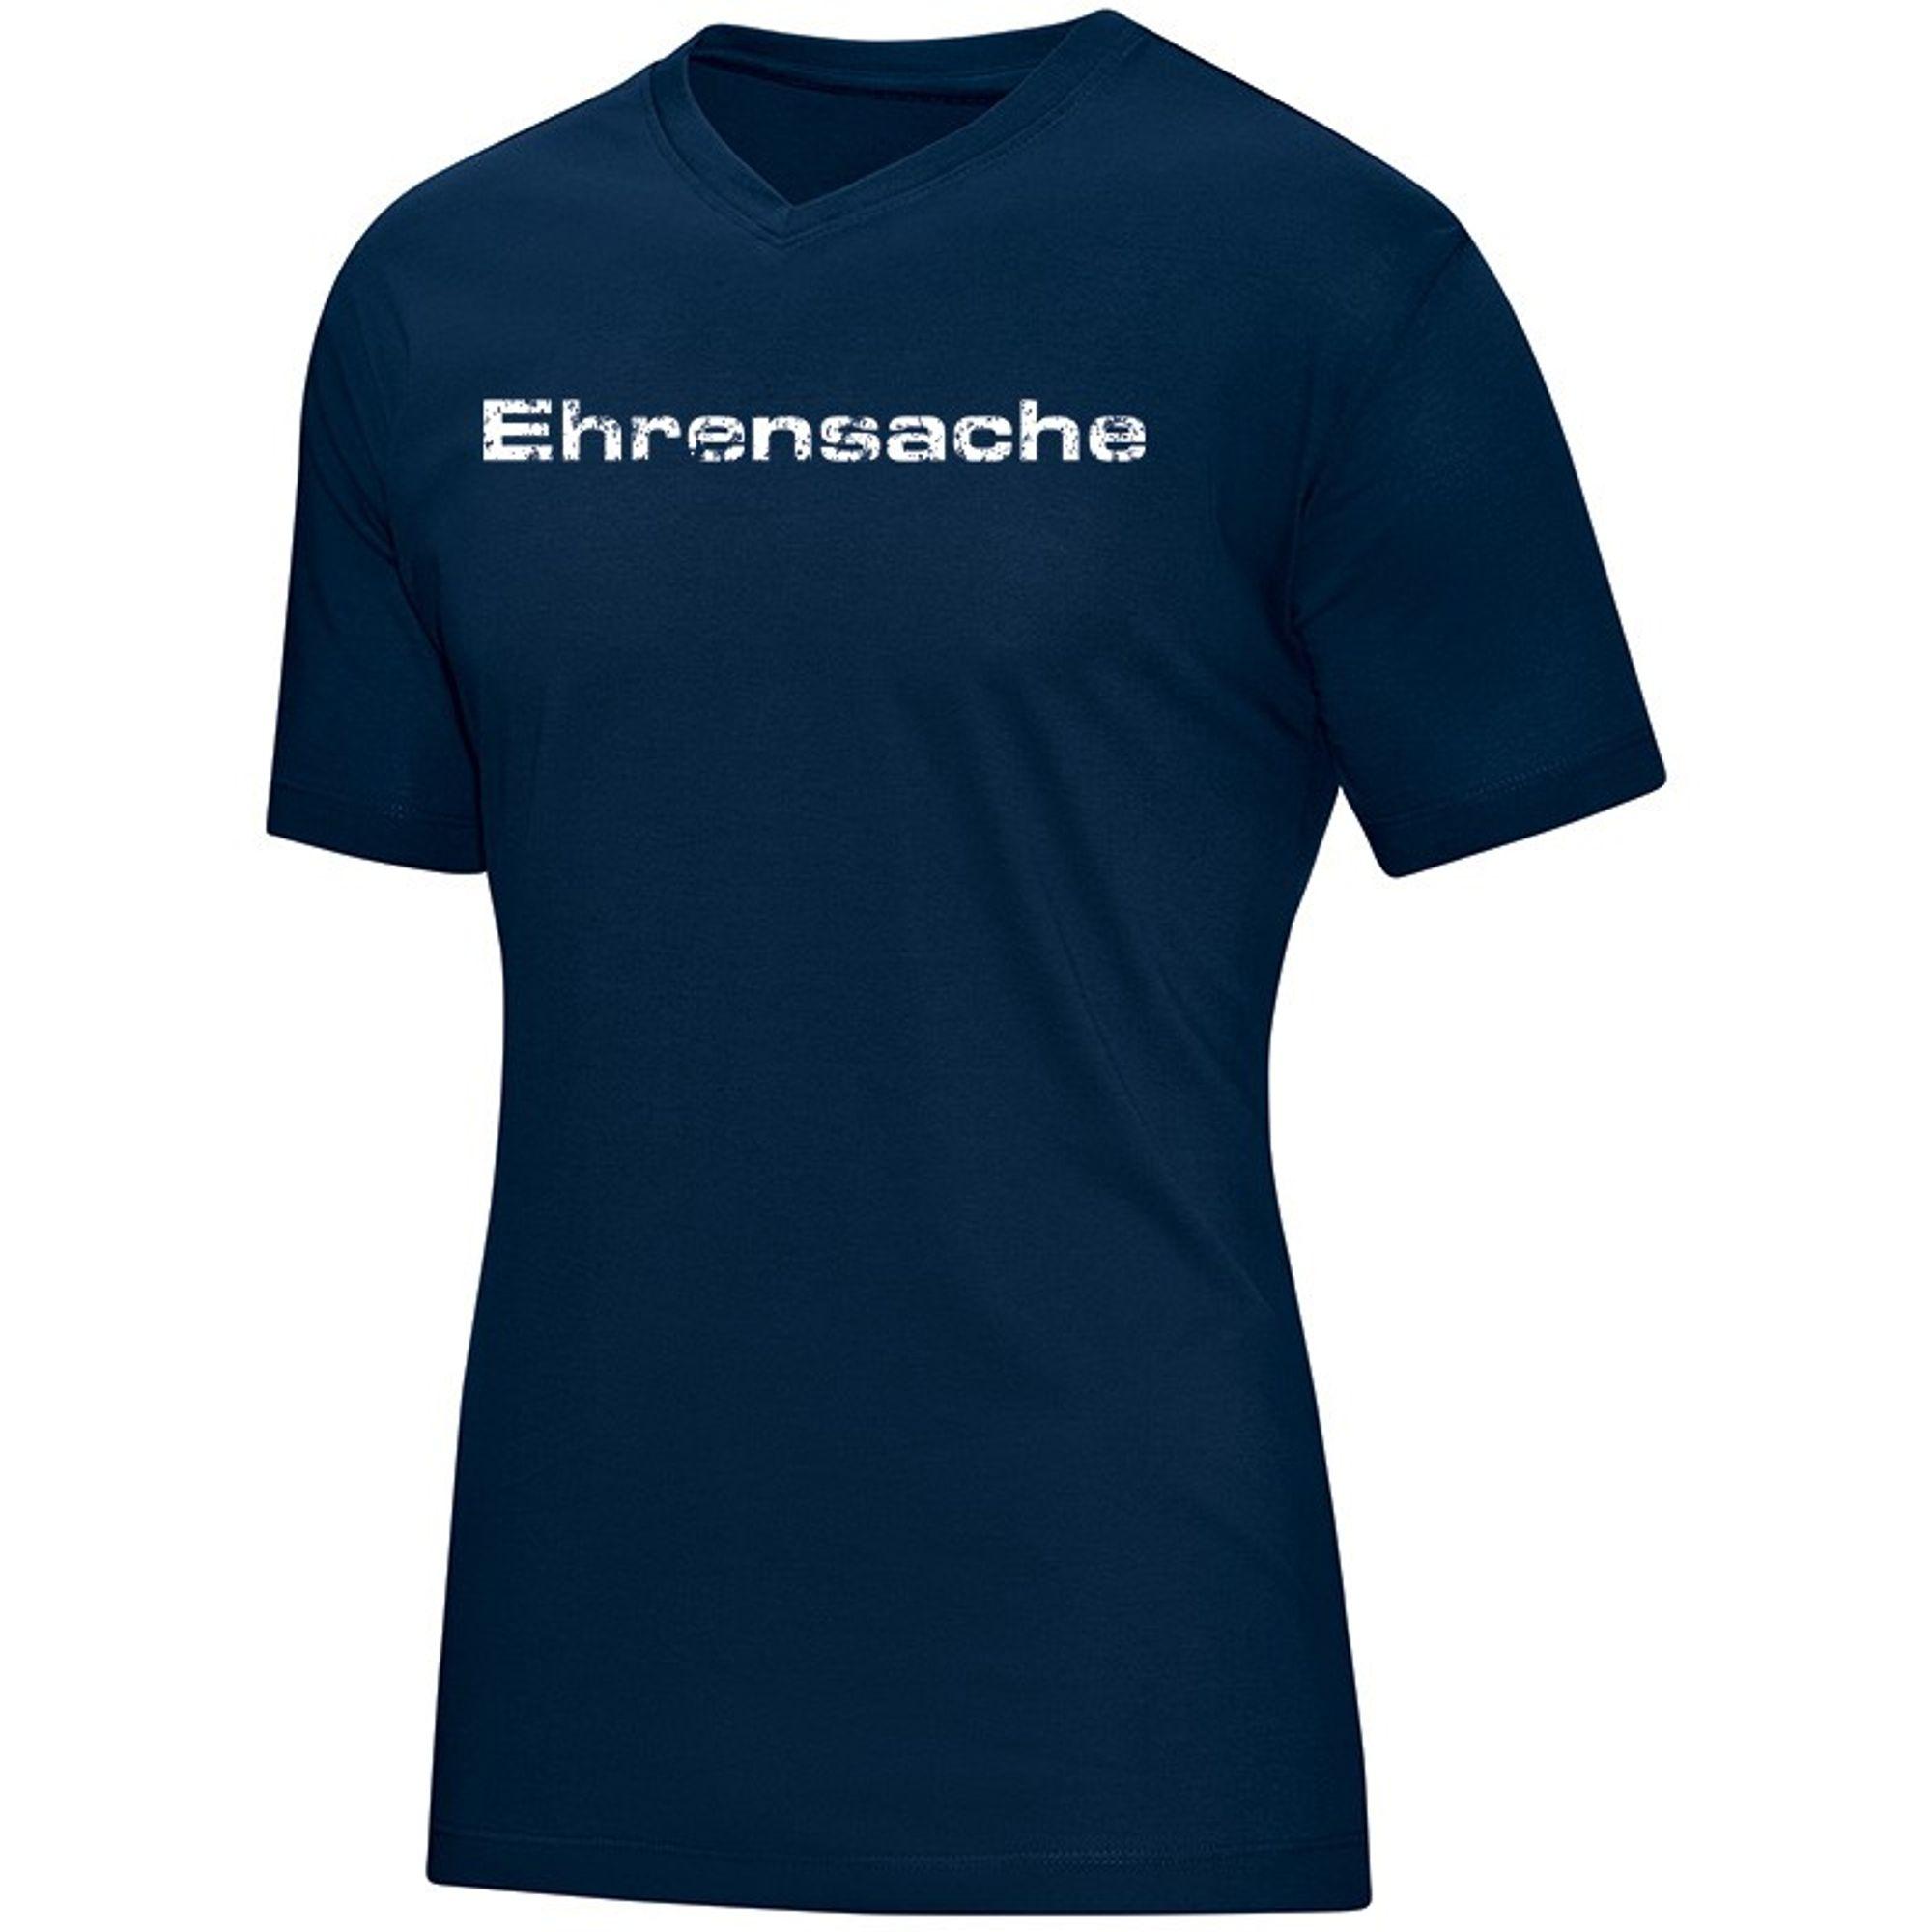 Jako Karlsruher Sc T-Shirt Ehrensache - marine